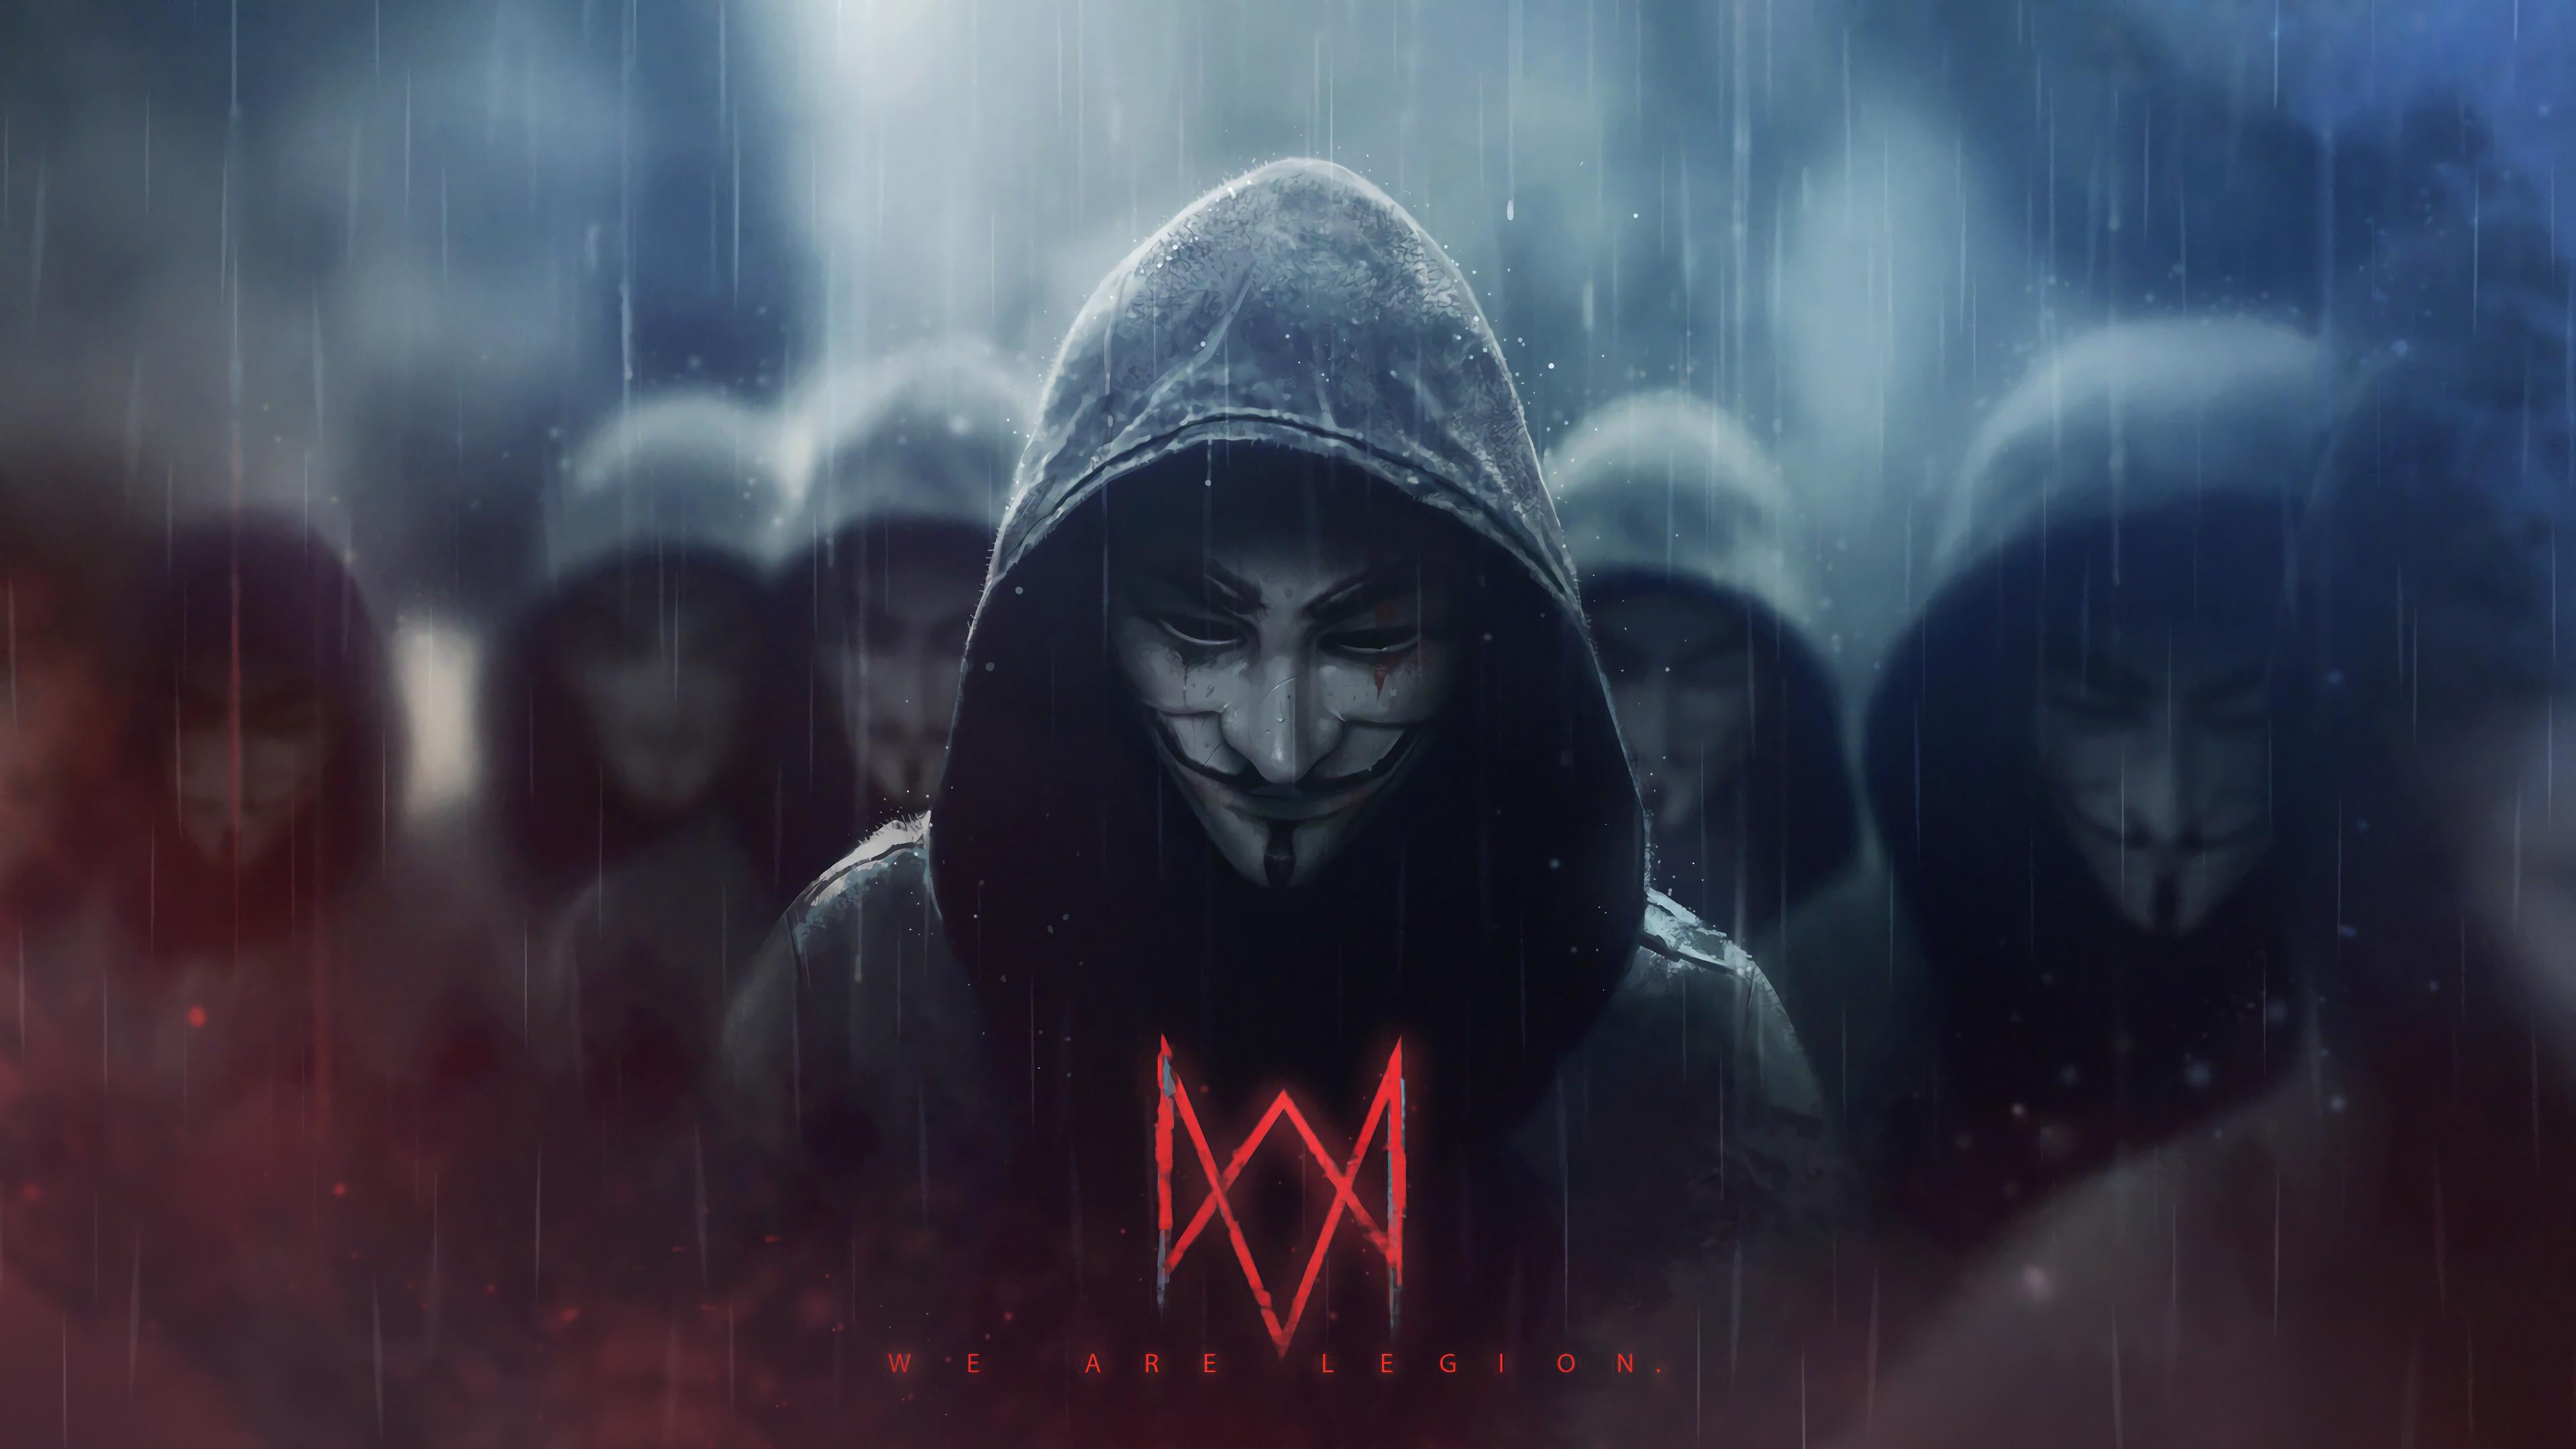 Ảnh Anonymous Hacker cực chất